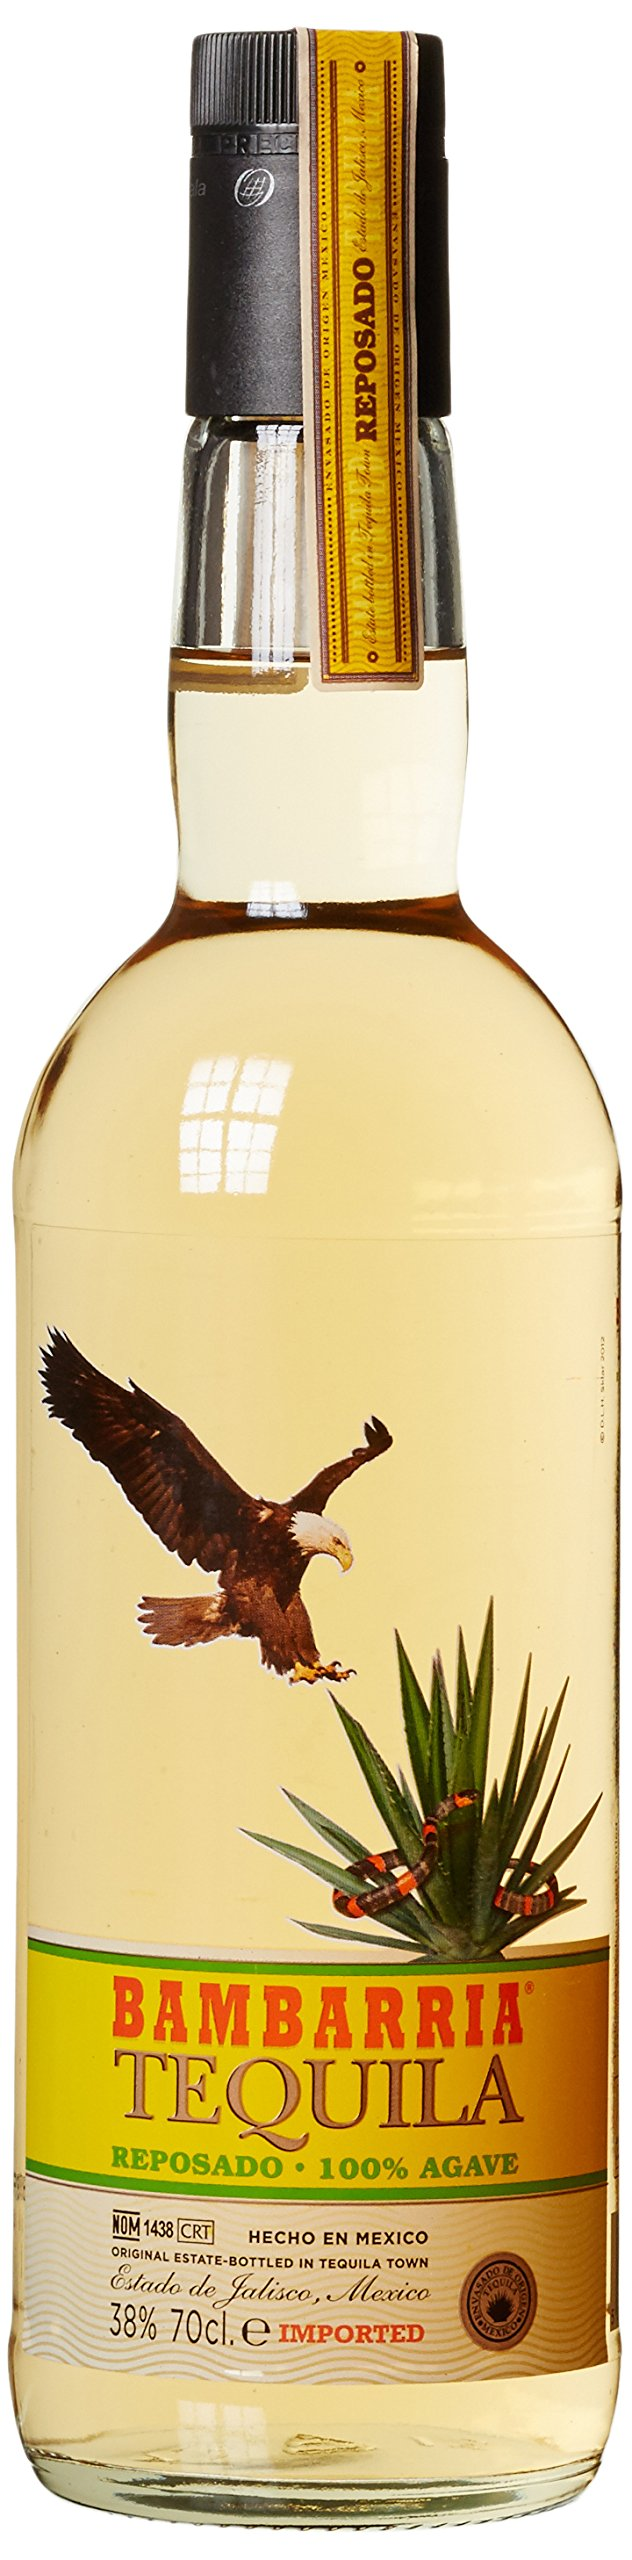 Bambarria-Tequila-Reposado-Agave-1-x-07-l